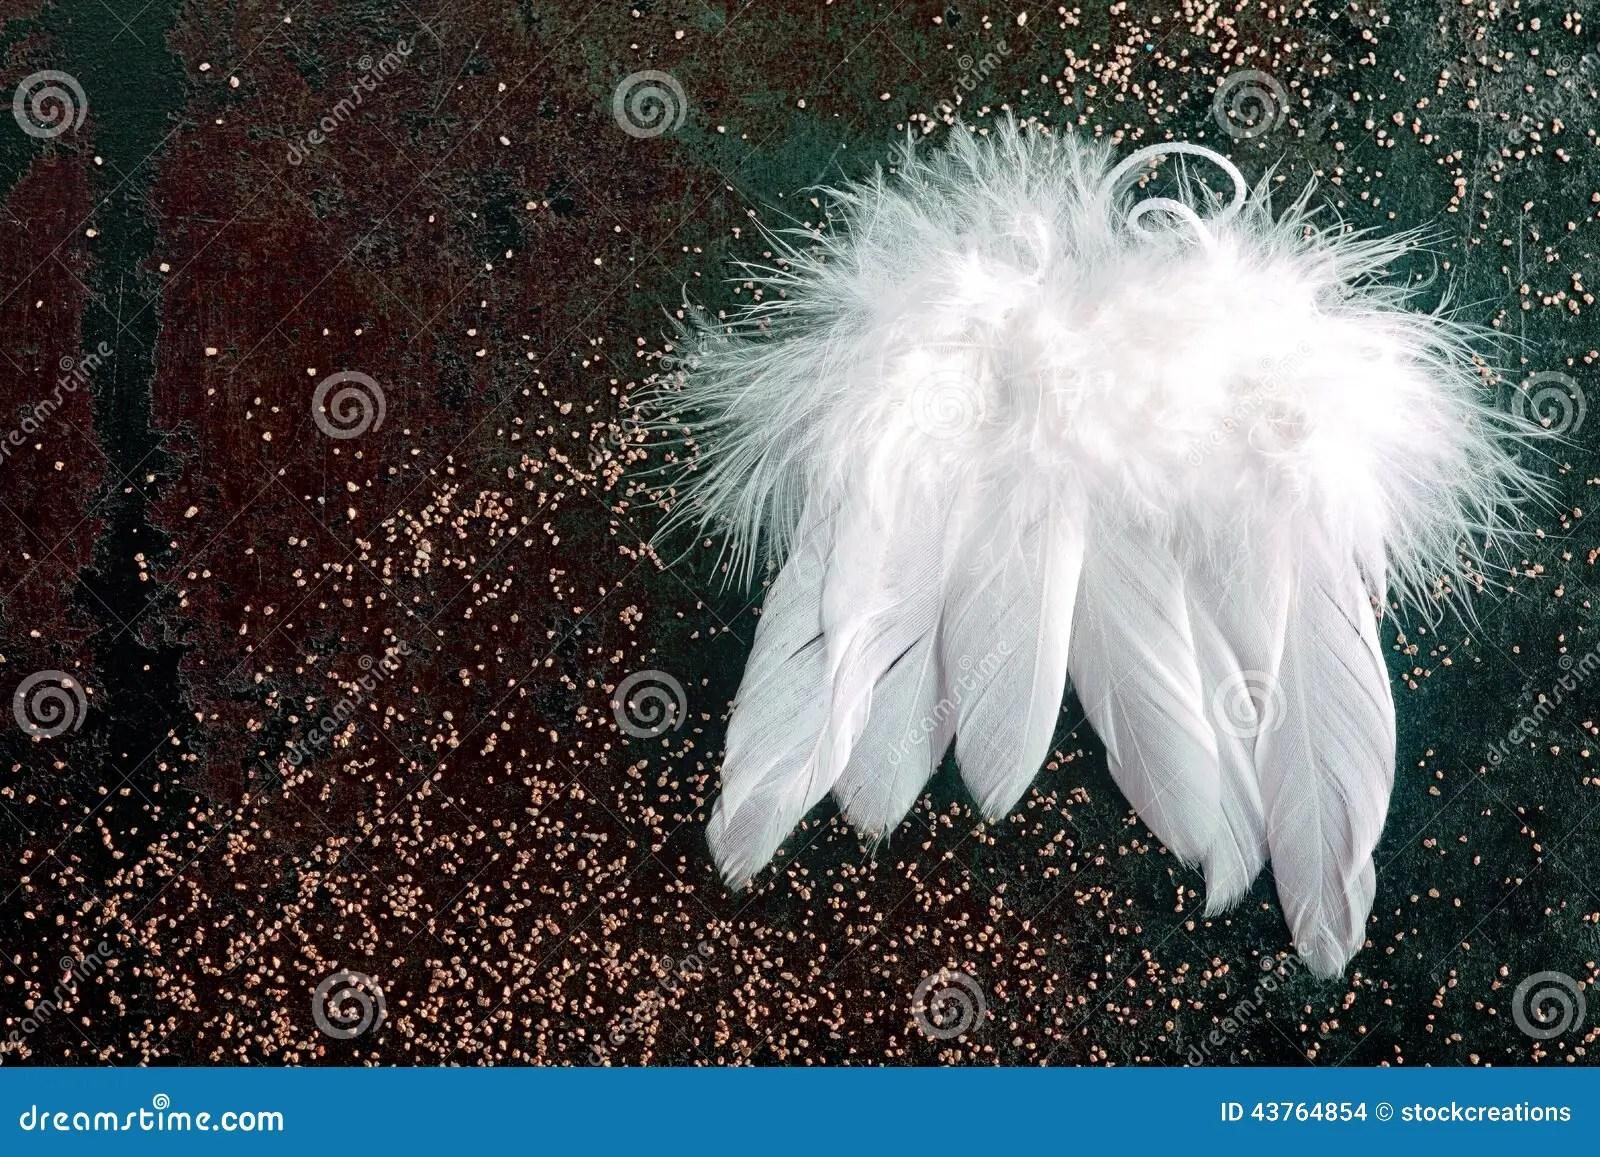 Soft White Christmas Angel Wings Stock Photo Image 43764854